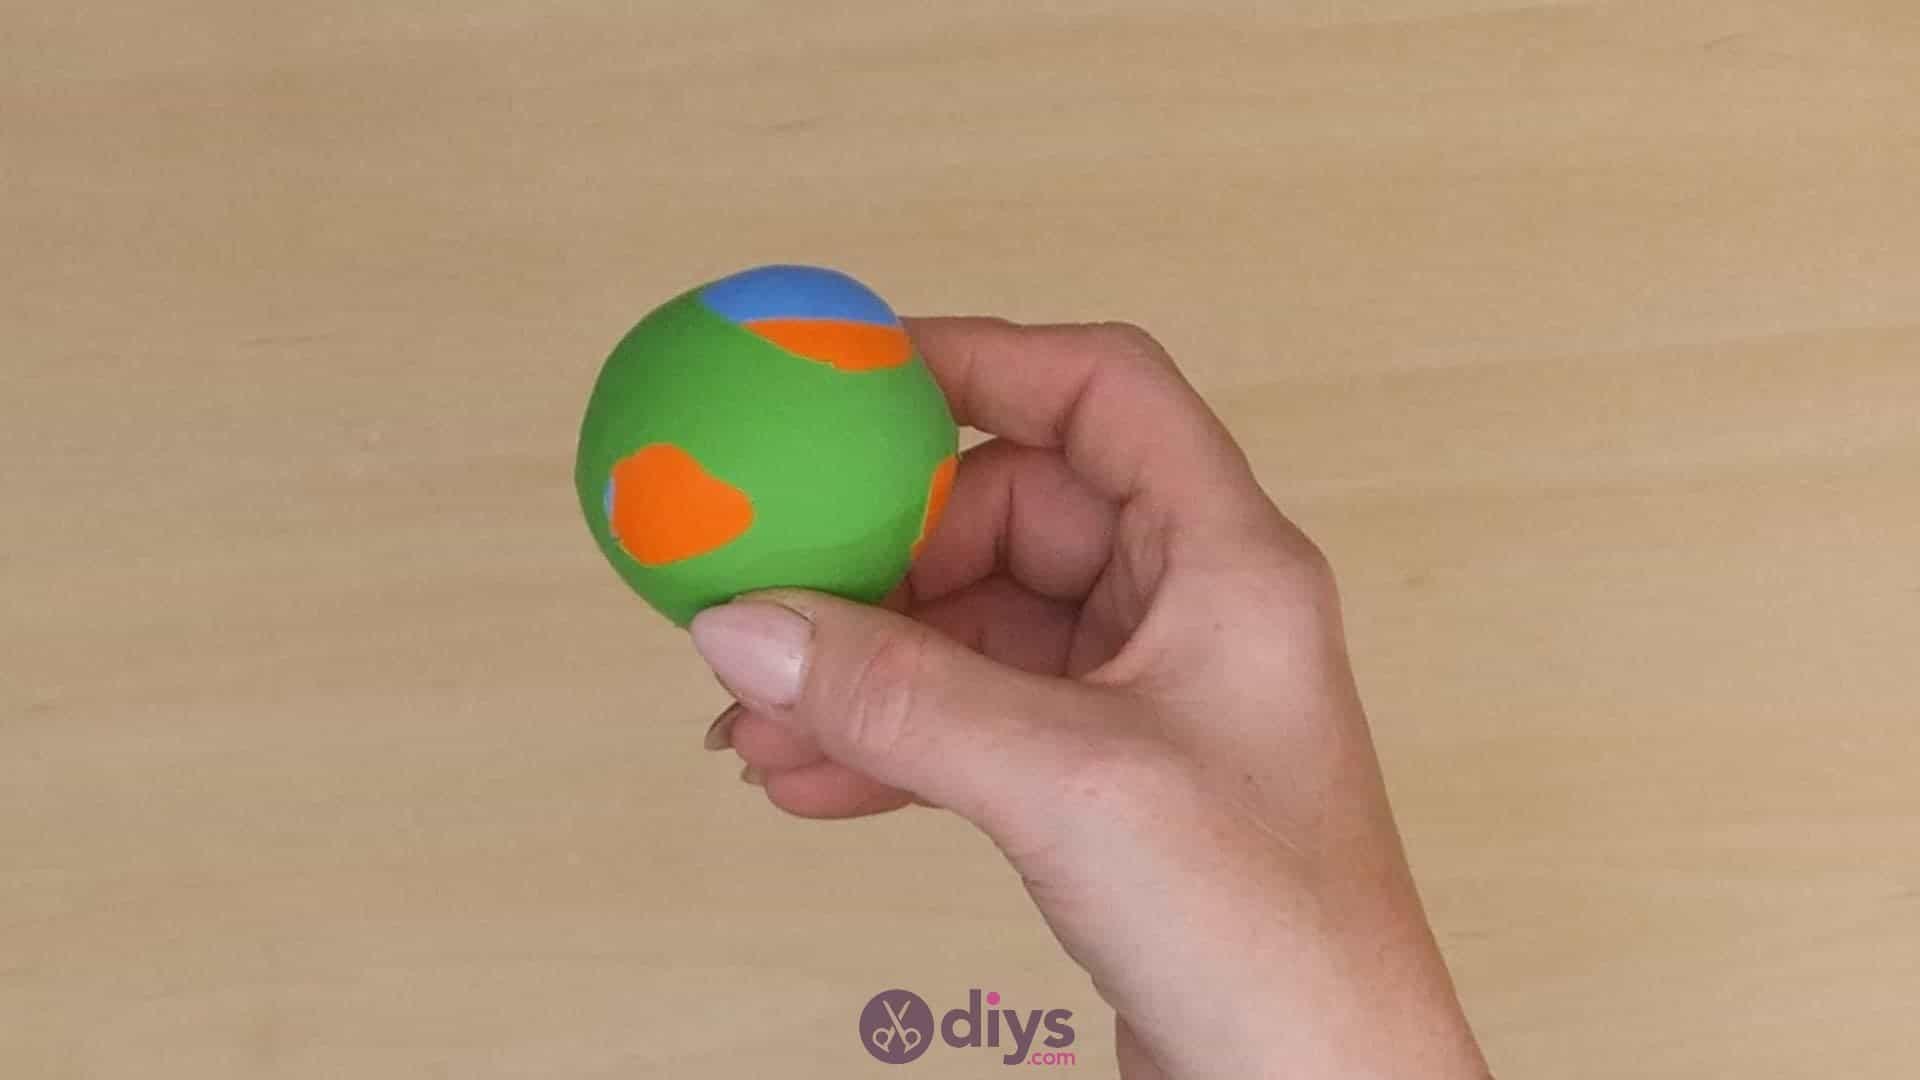 Diy juggling balls step 6b